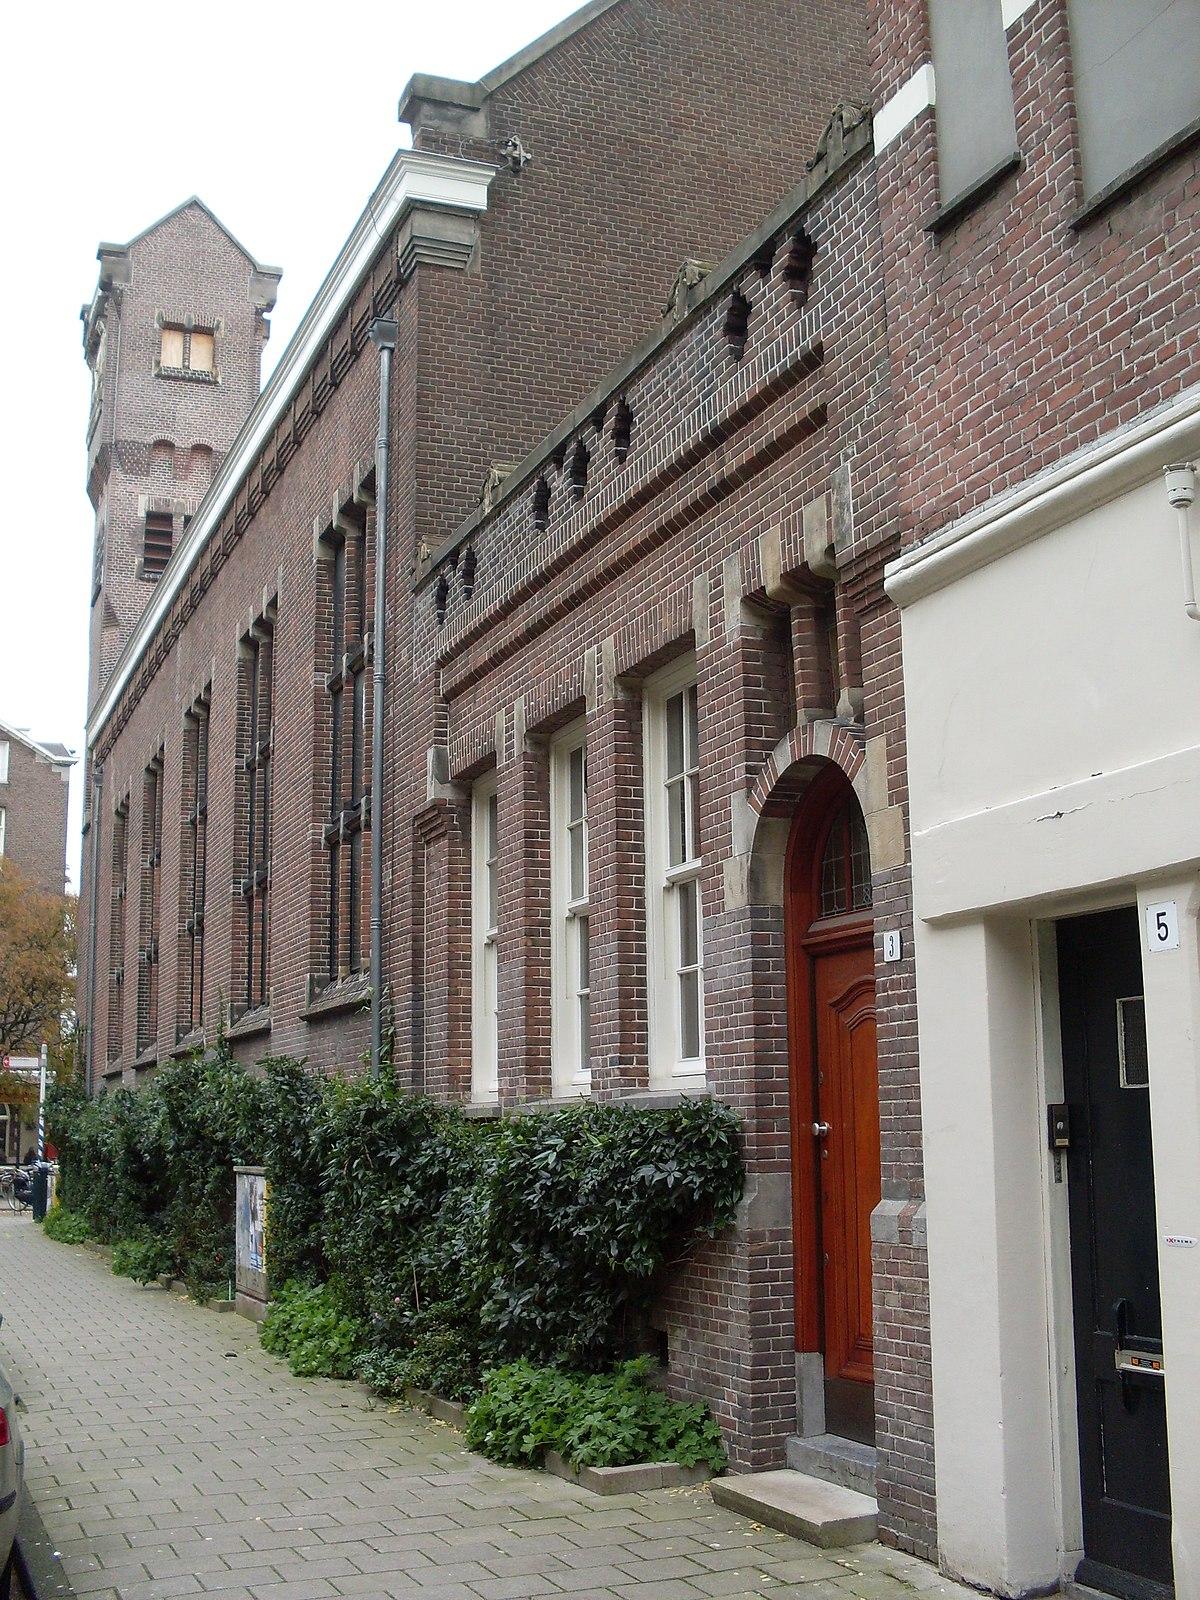 Extrêmement Duivelseiland (Amsterdam) - Wikipedia EA11